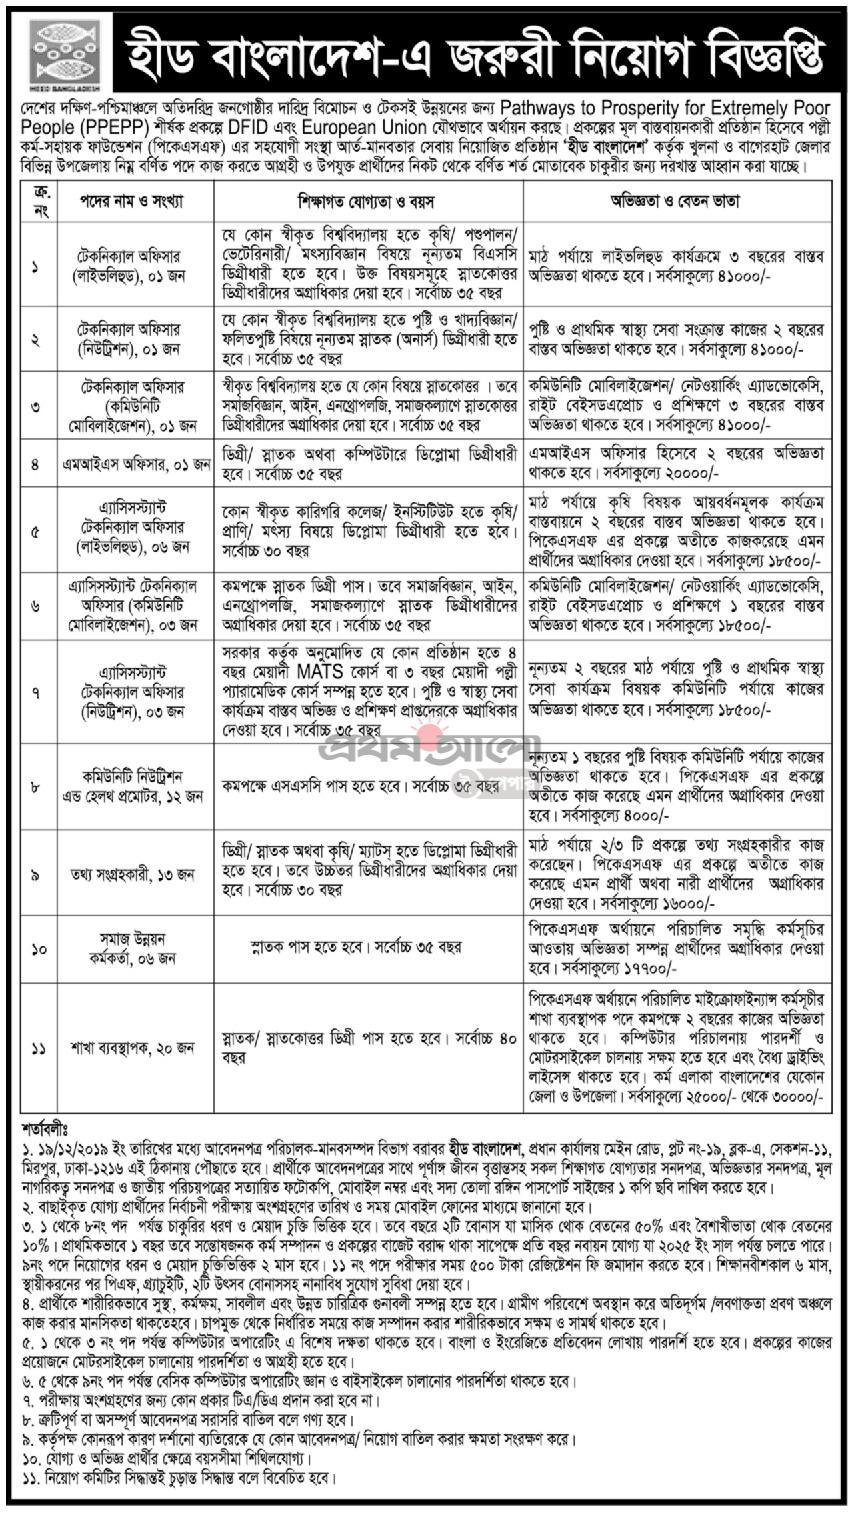 heed bangladesh Job Circular 2019